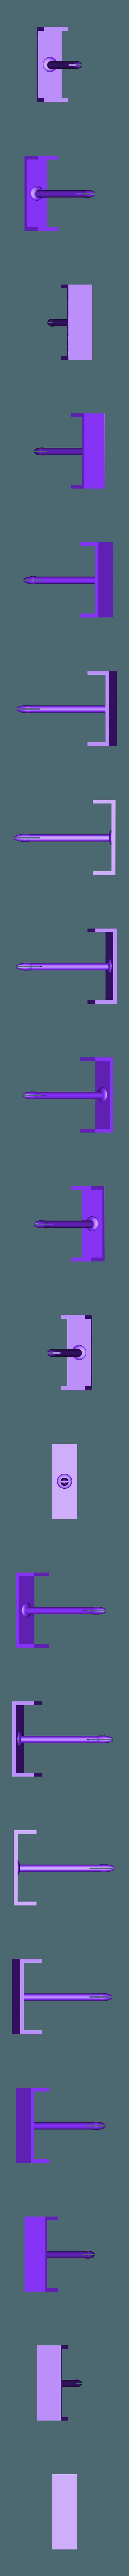 bushing_holder_v1.stl Download free STL file pen bushing organizer • 3D printer object, drykill_23